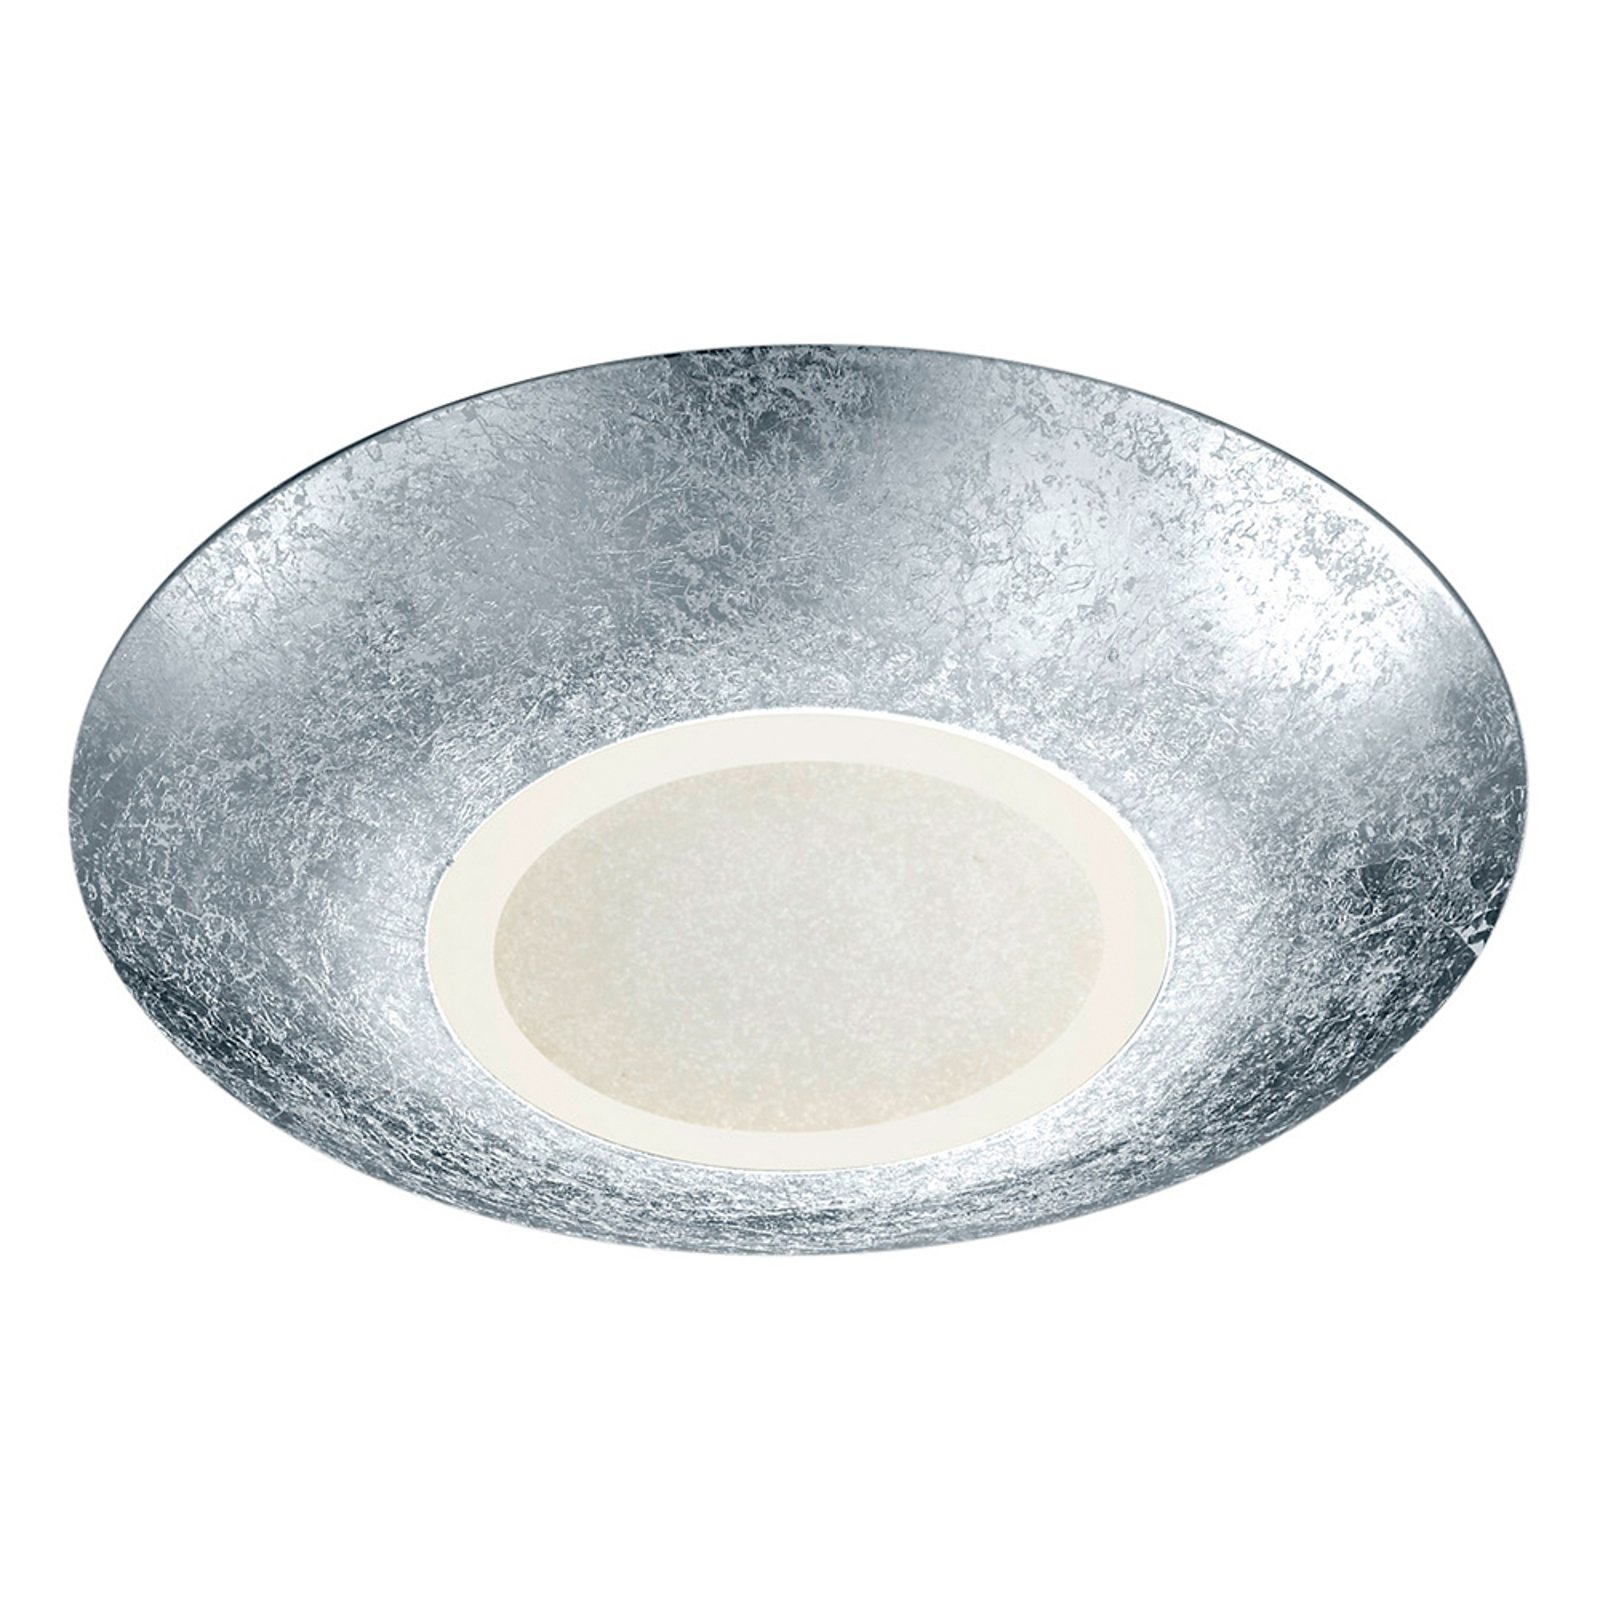 Sølvfarget LED-taklampe Chiros rund